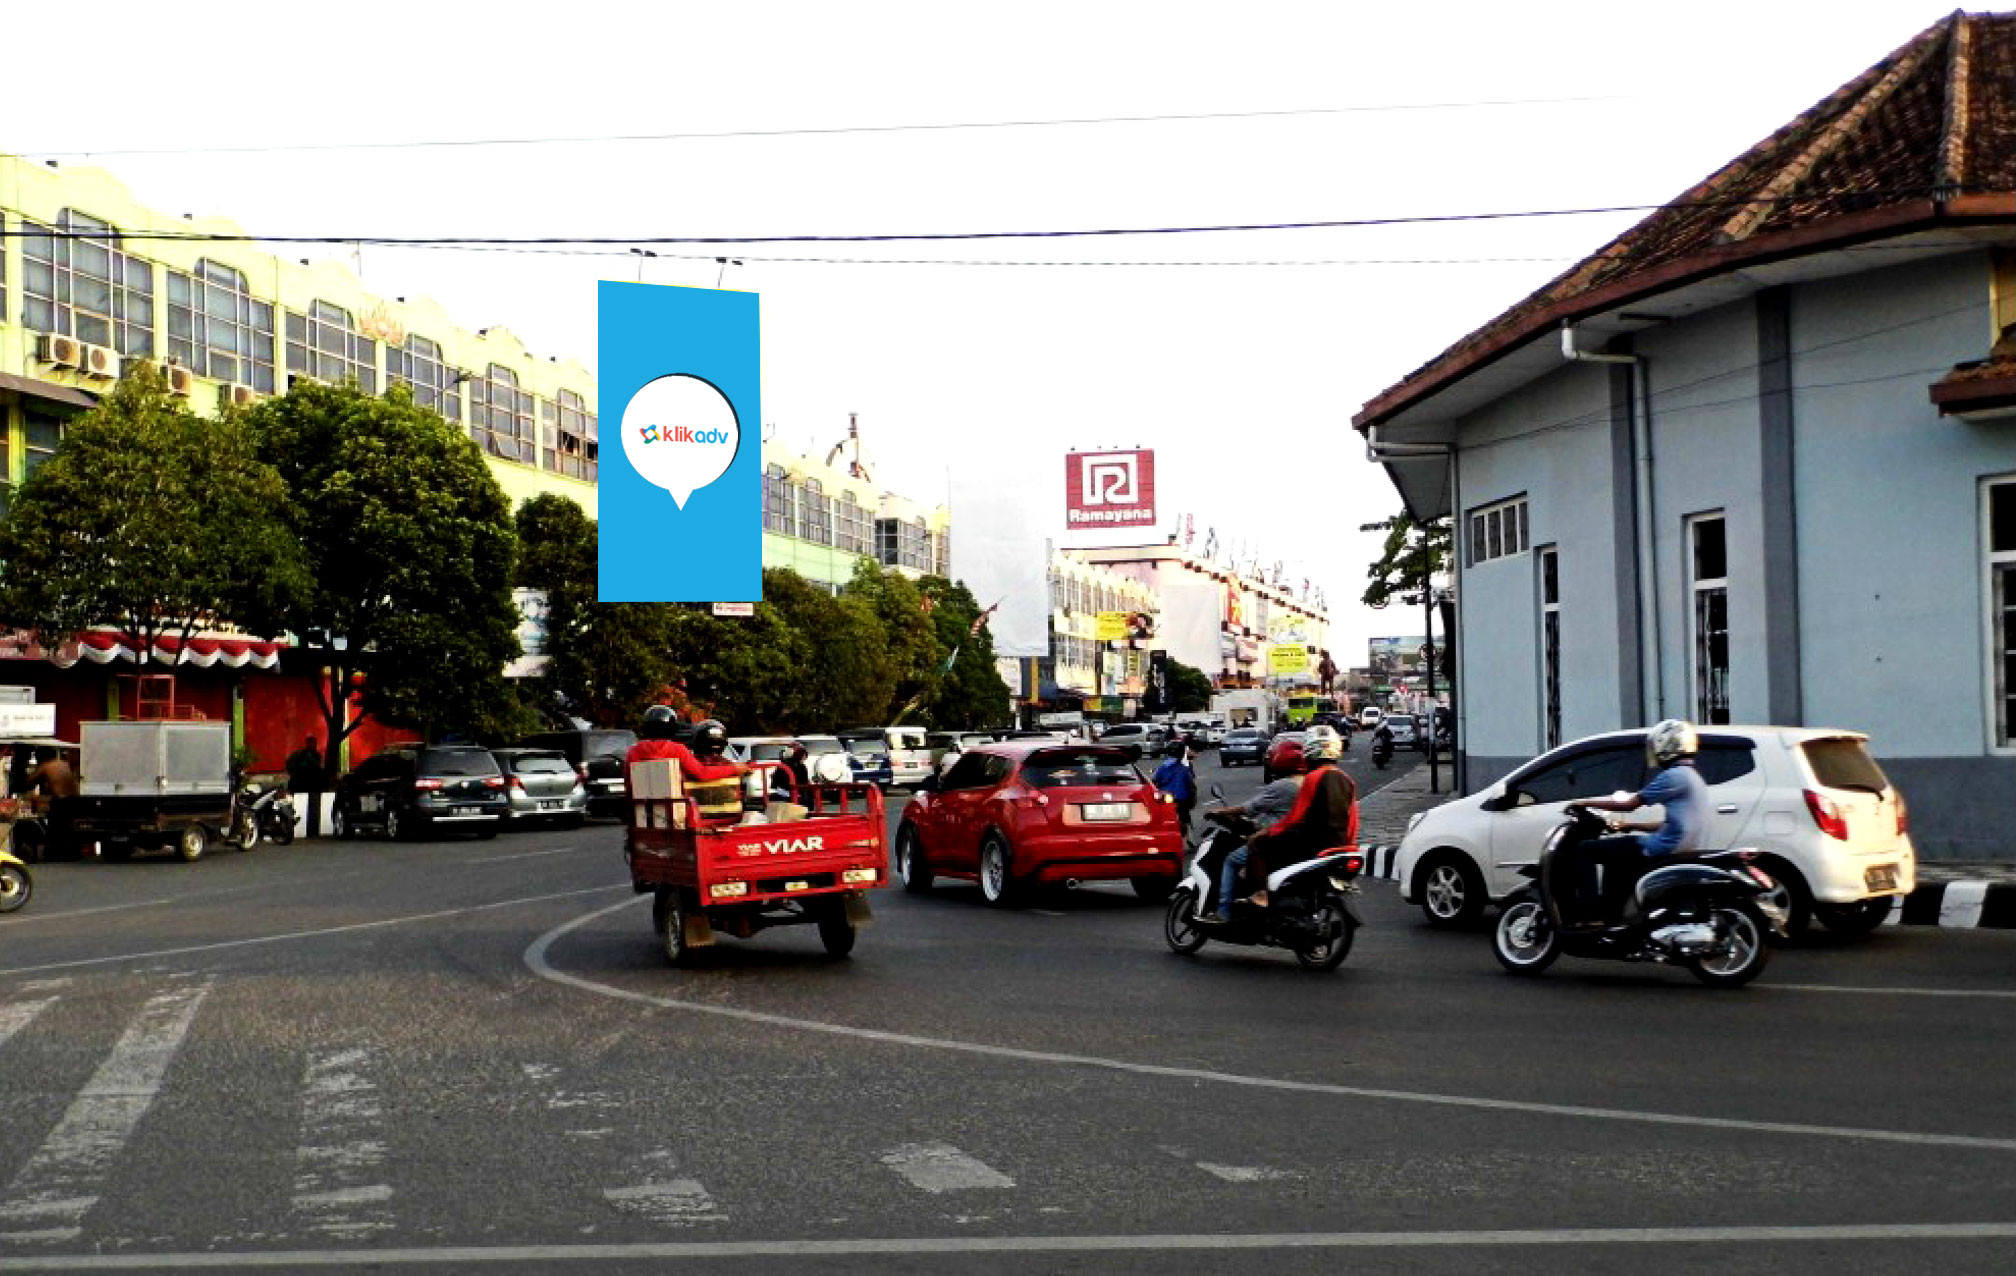 Sewa Billboard Lampung Kota Bandar Jl Raden Intan 007 Bb